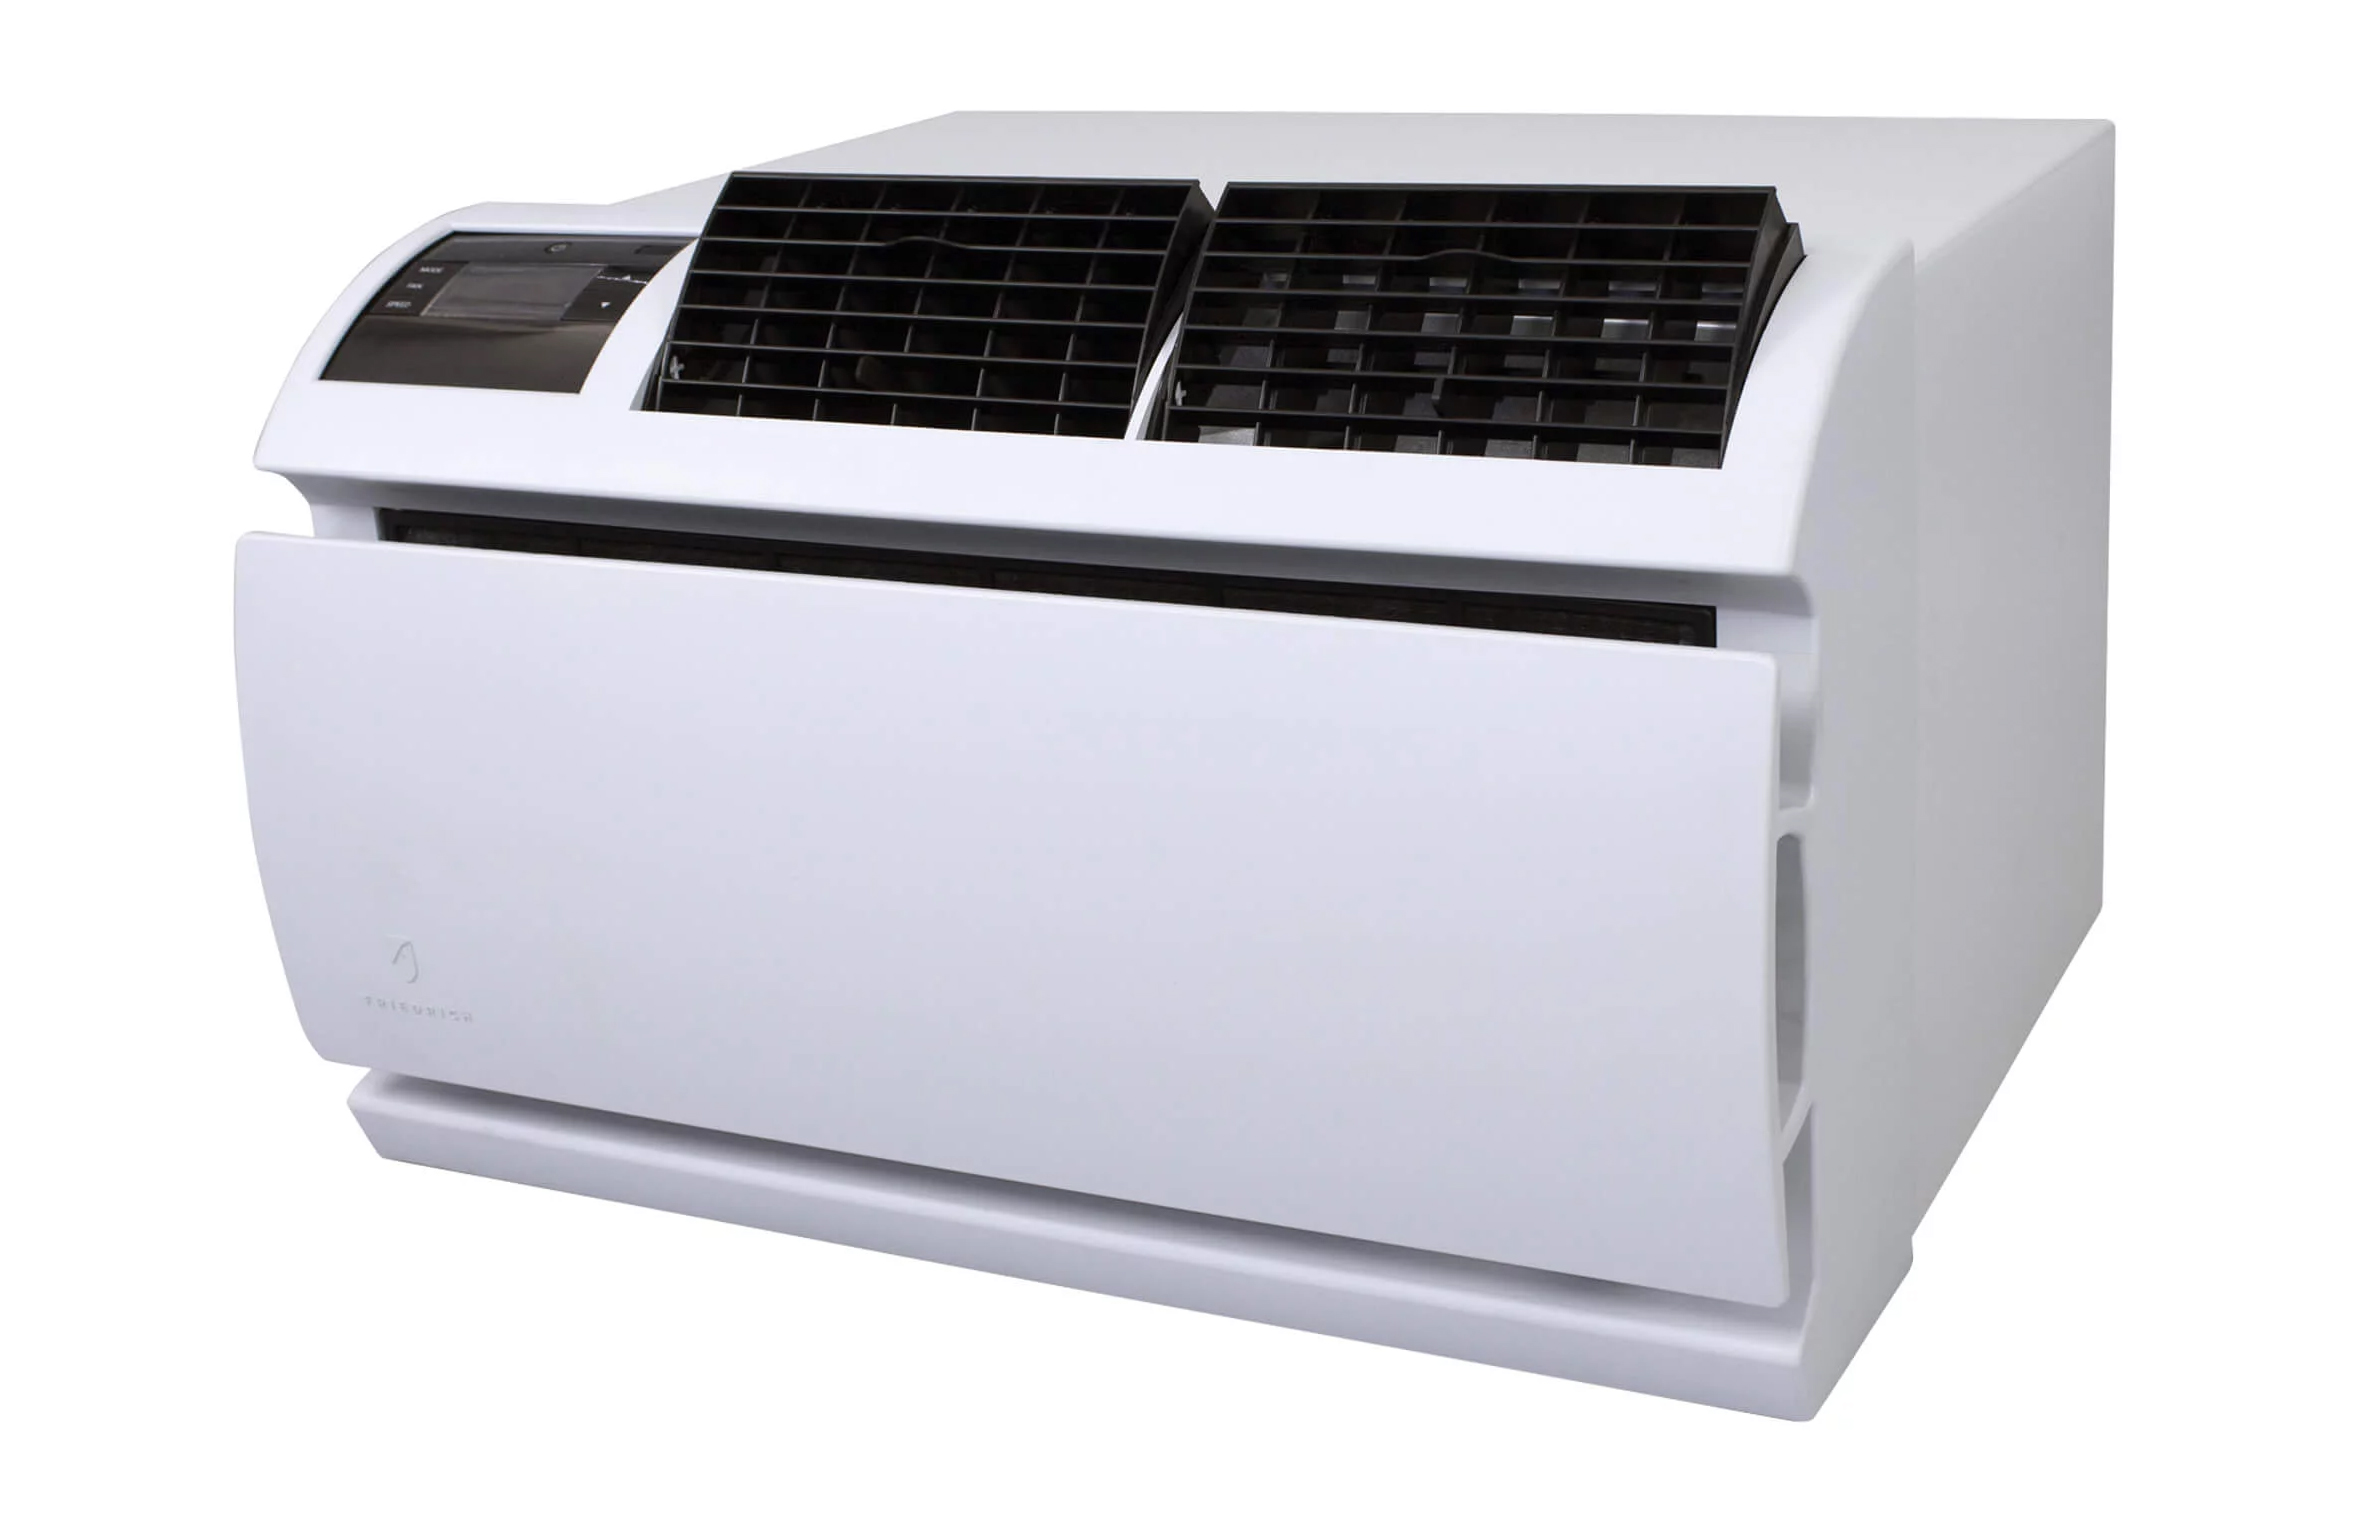 Friedrich WET10A33A Wallmaster Series 10000 BTU Smart WiFi Through-the-Wall Air Conditioner with Electric Heat - 208/230 Volt